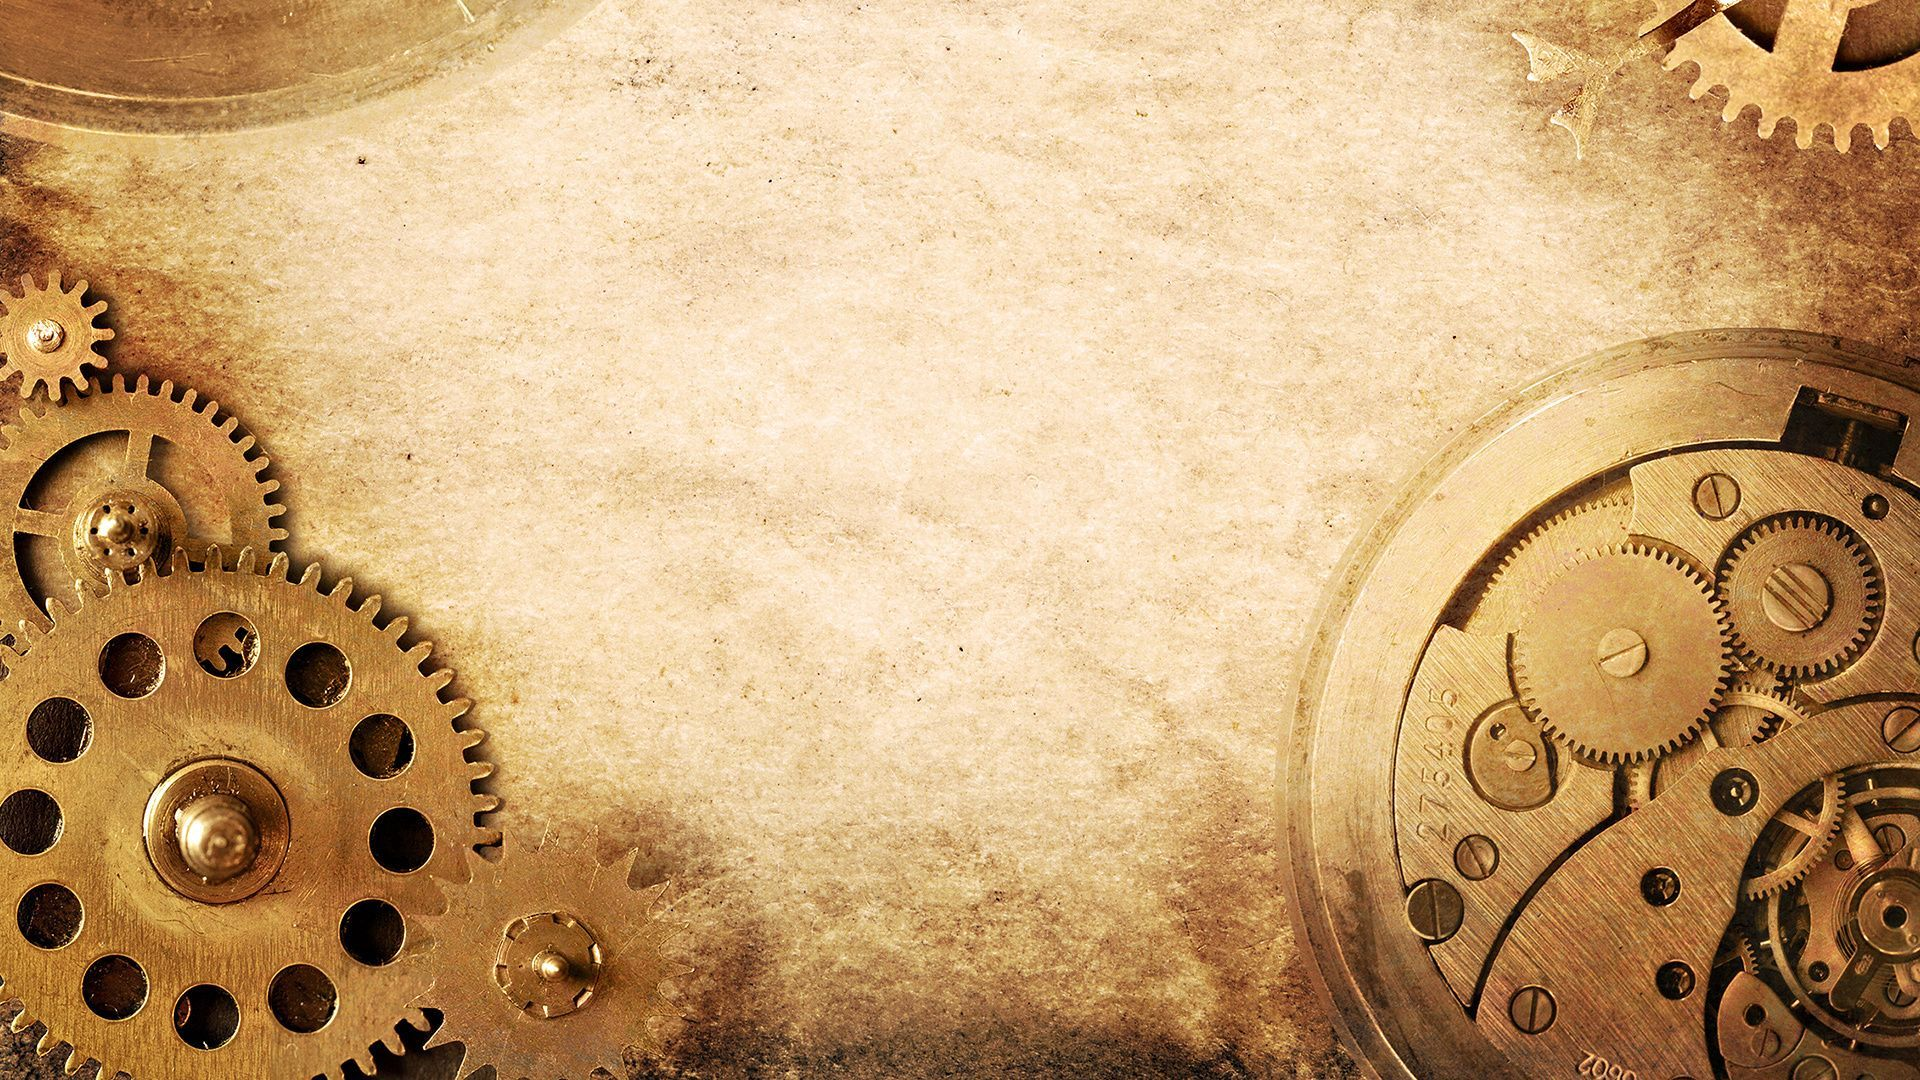 Free Download Of Original Technologies Of Gear Clockwork Watch Stimp